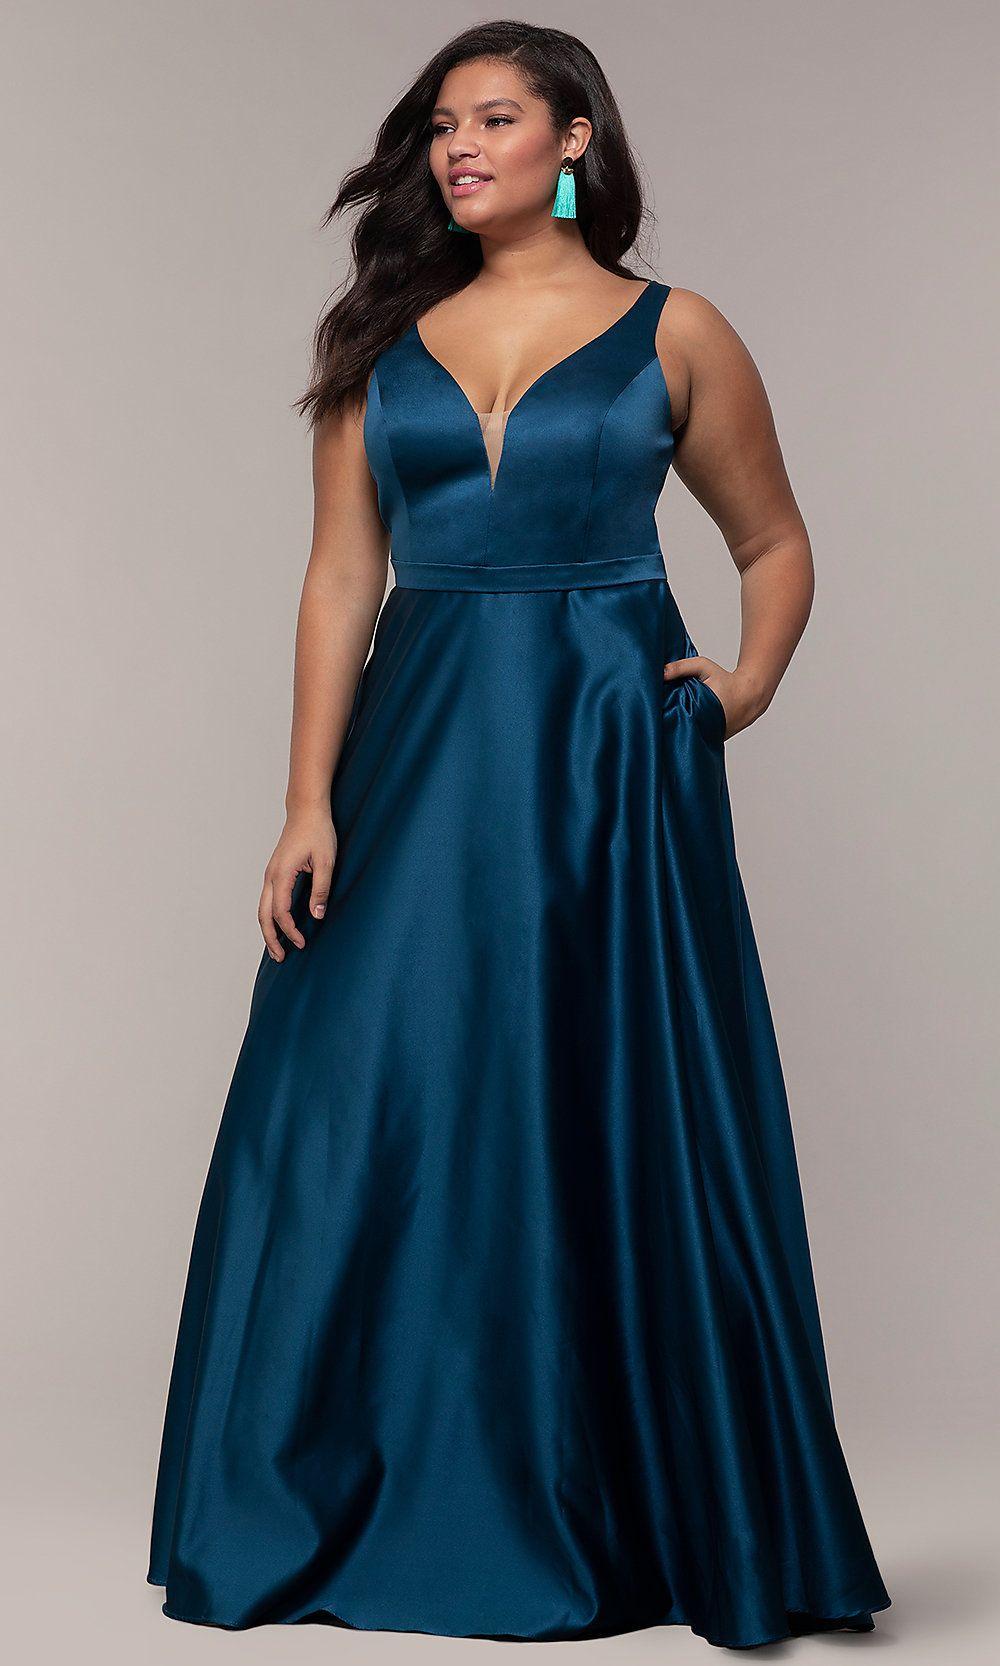 fde4a582346 Long A-Line V-Neck Plus-Size Prom Dress by PromGirl